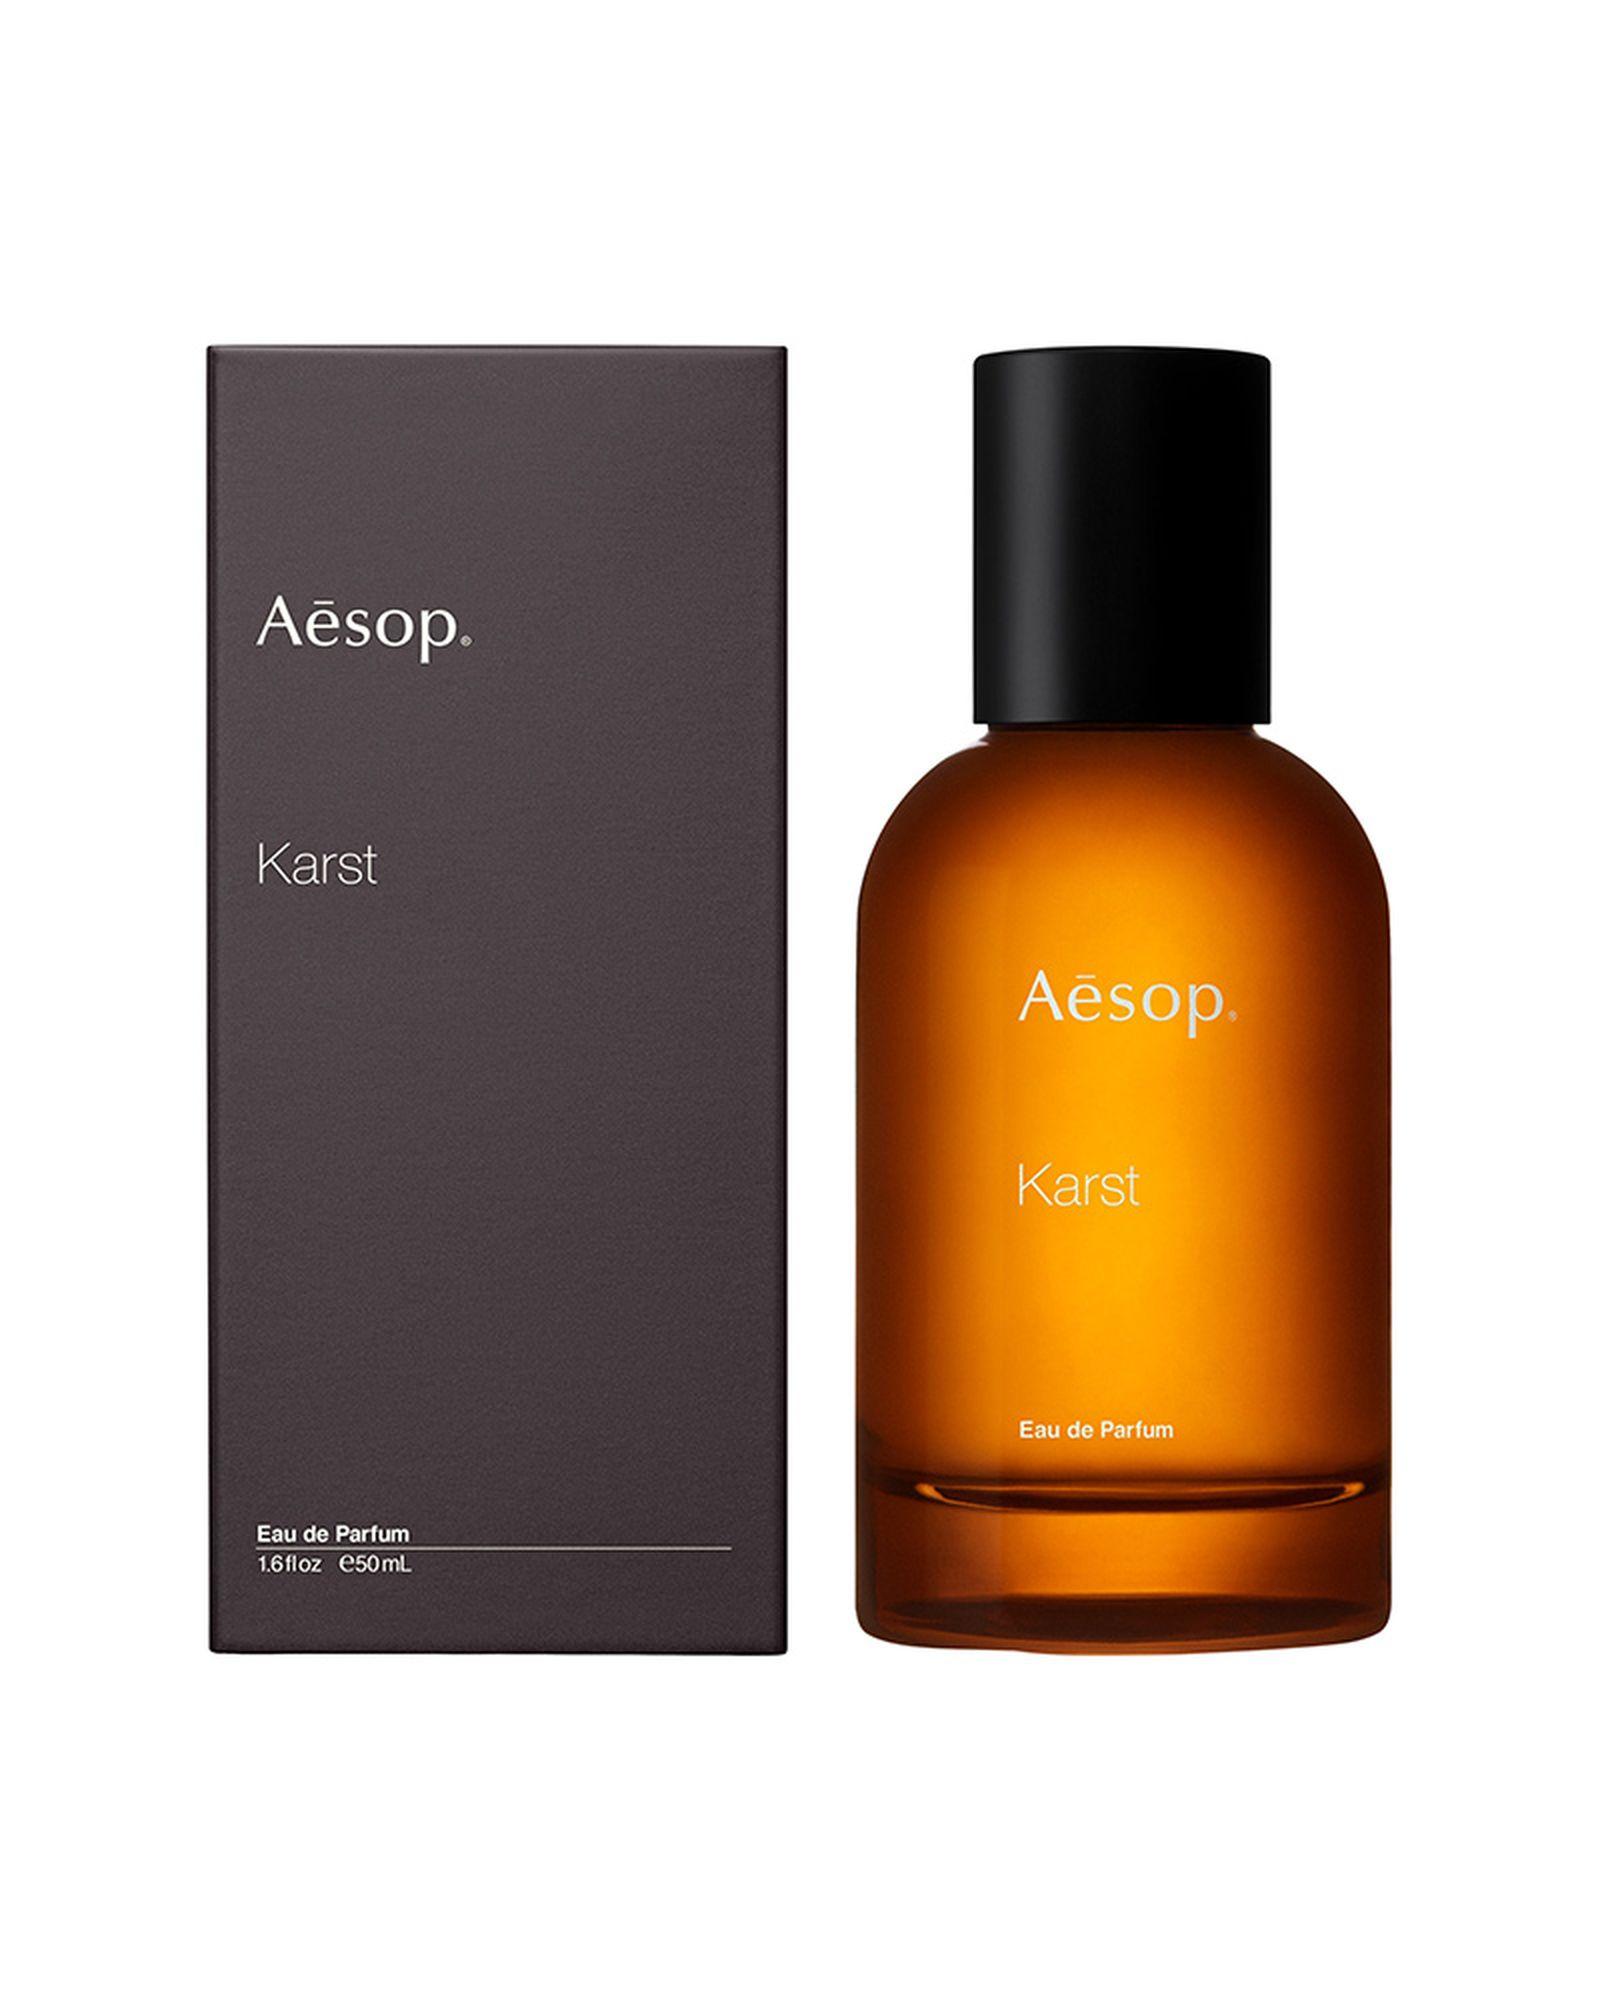 aesop-othertopias-fragrance-collection-03